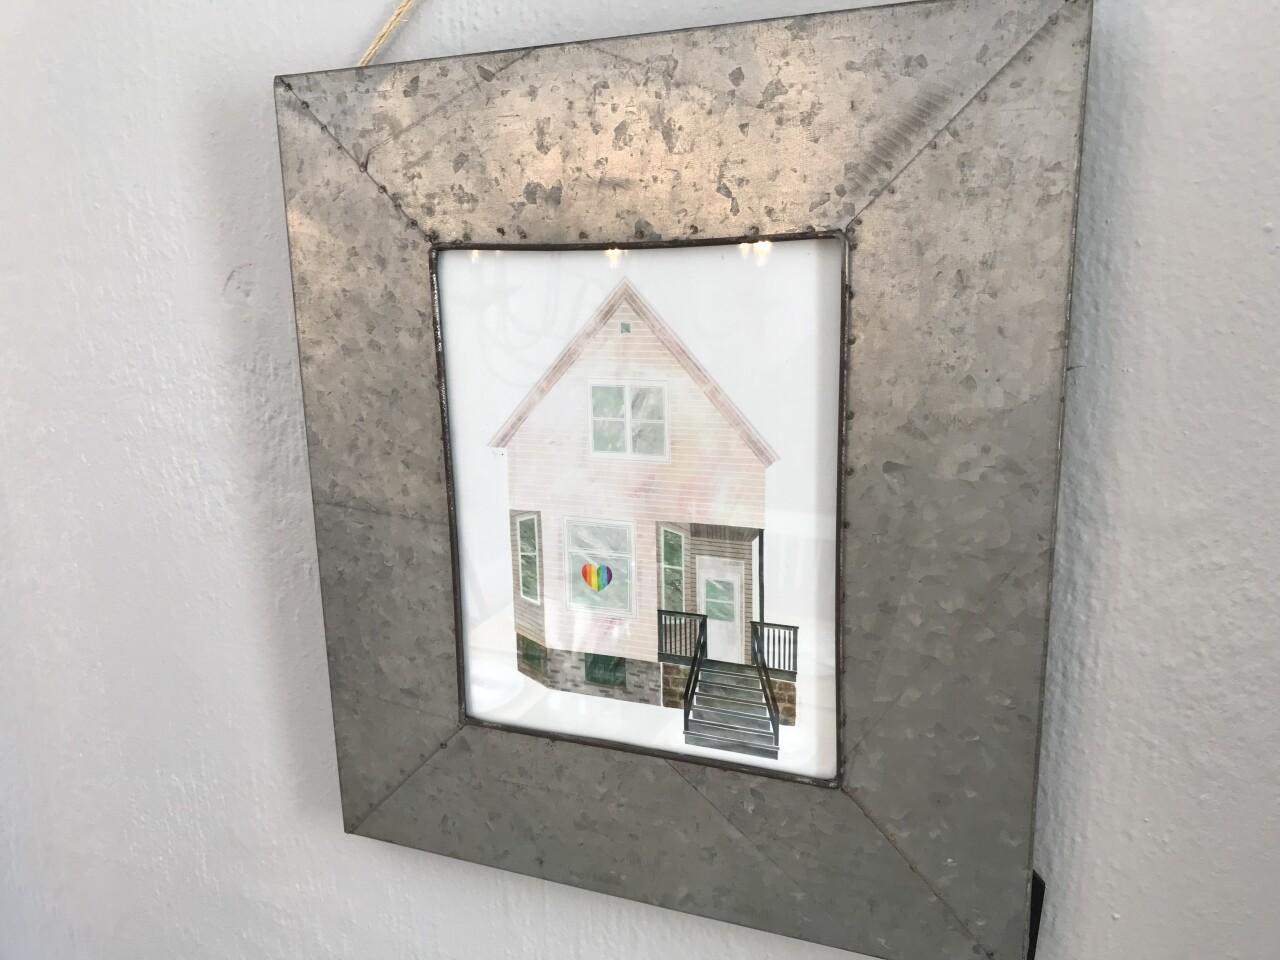 Courage House artwork